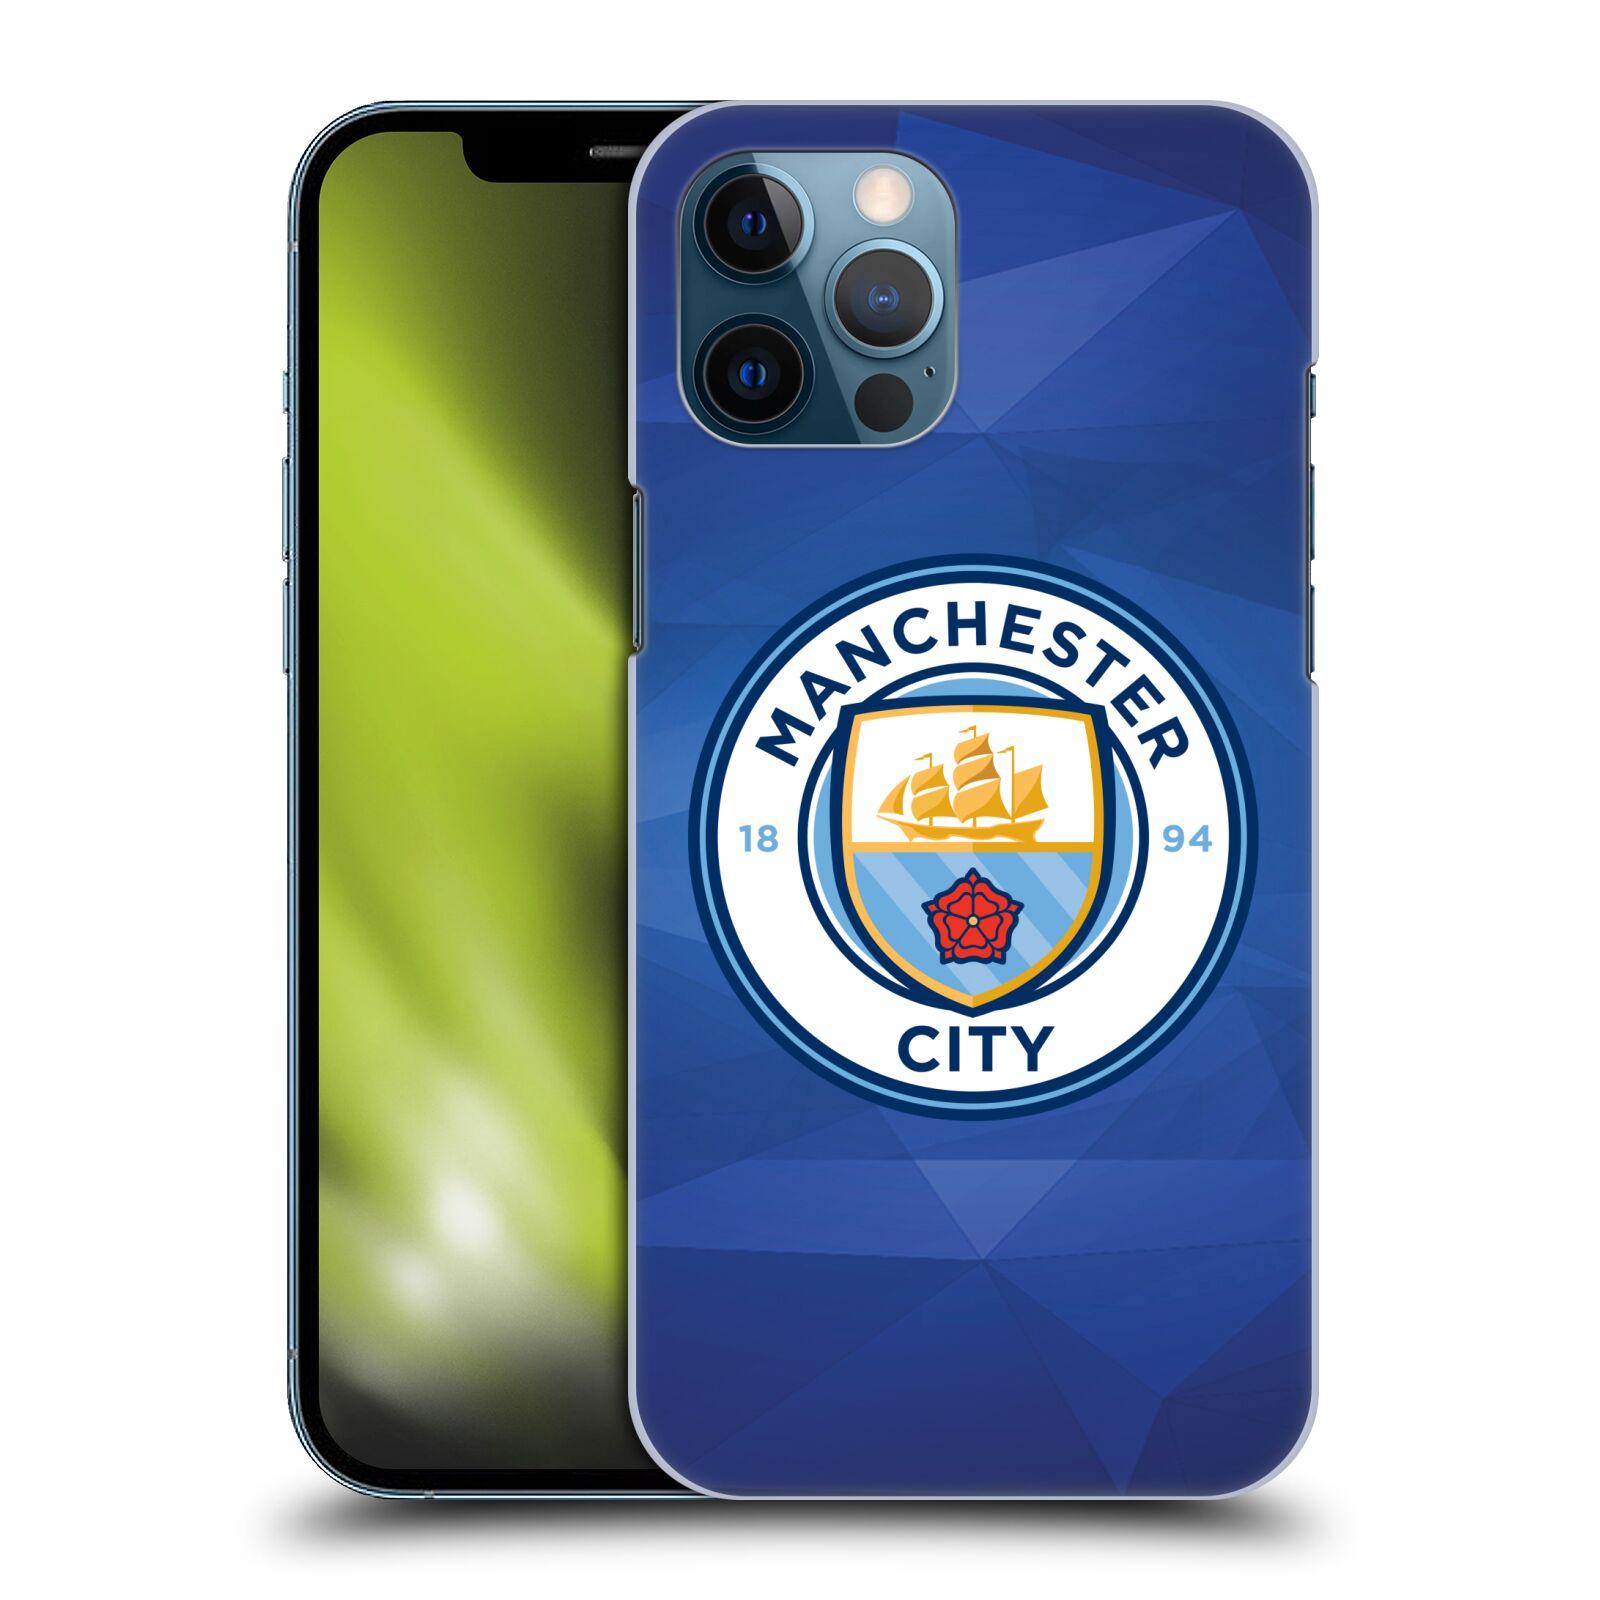 Plastové pouzdro na mobil Apple iPhone 12 Pro Max - Head Case - Manchester City FC - Modré nové logo